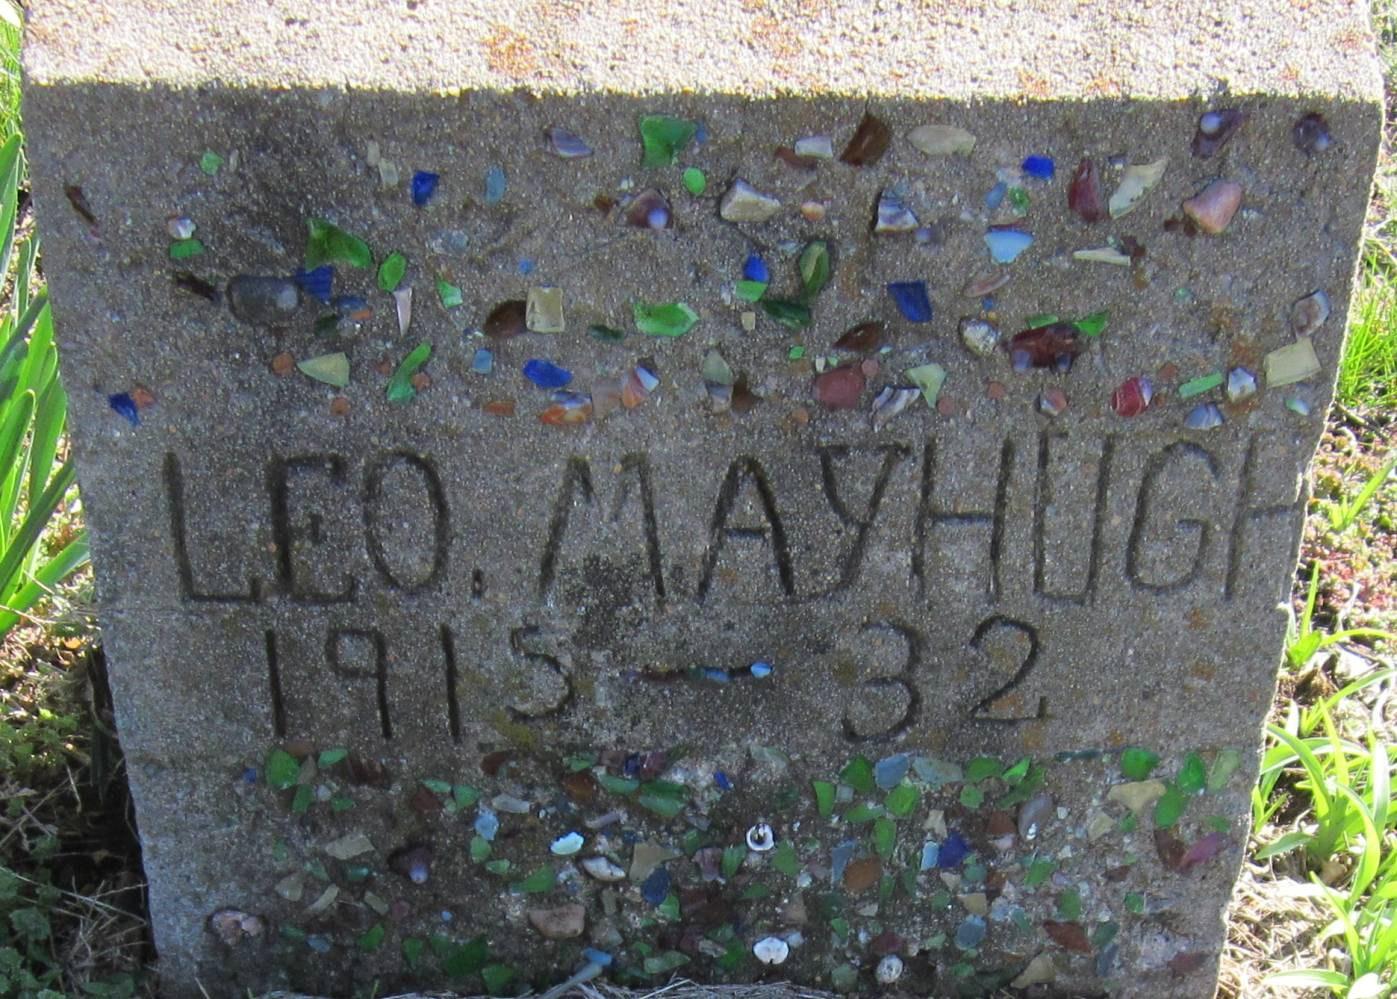 Ray E Mayhugh